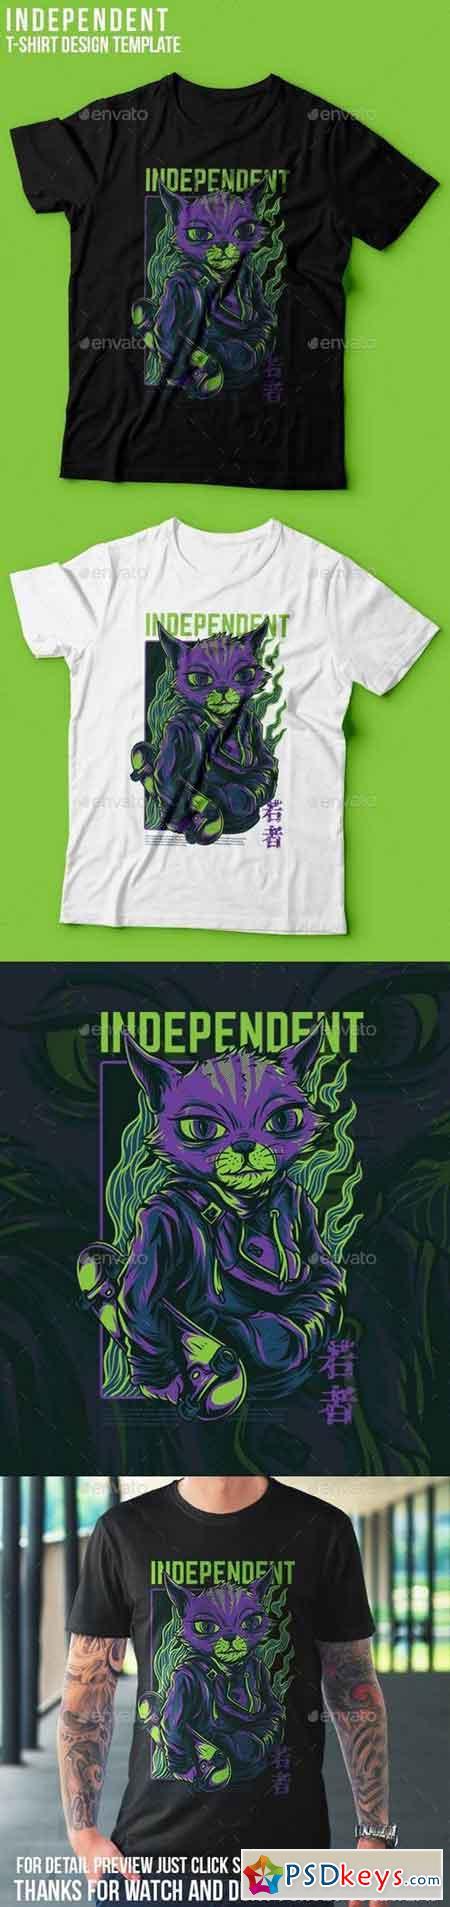 Independent Cat T-Shirt Design 23109812